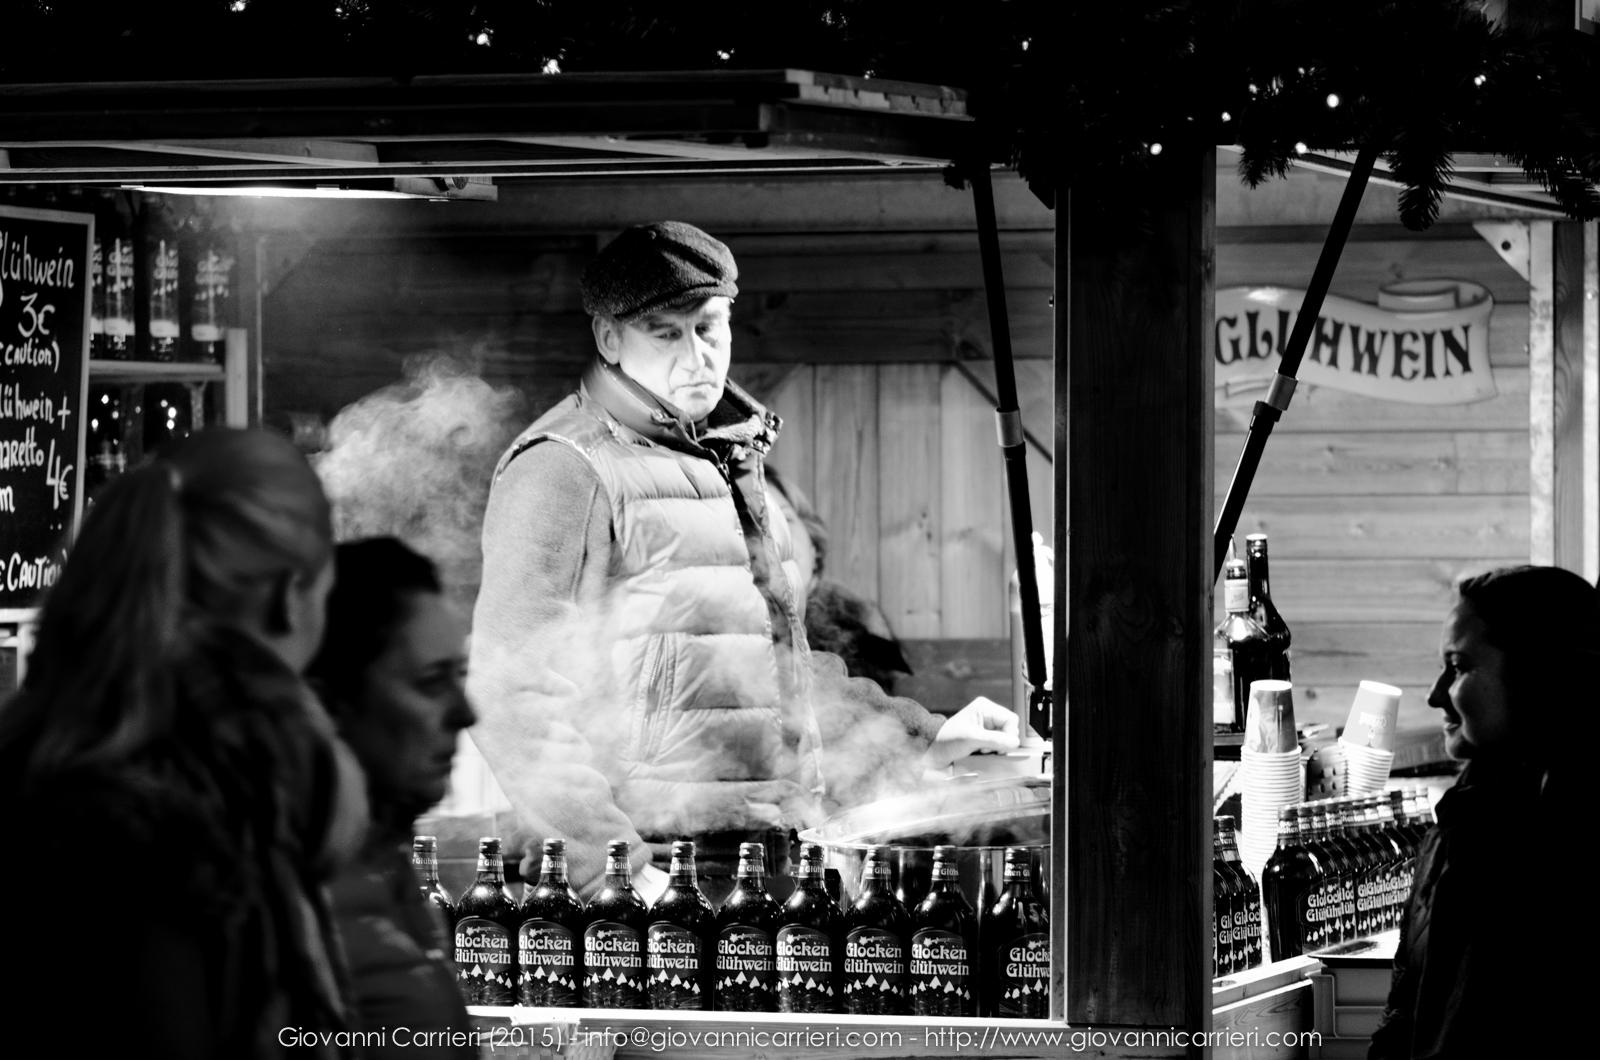 Scena dal mercatino di natale Lussemburghese